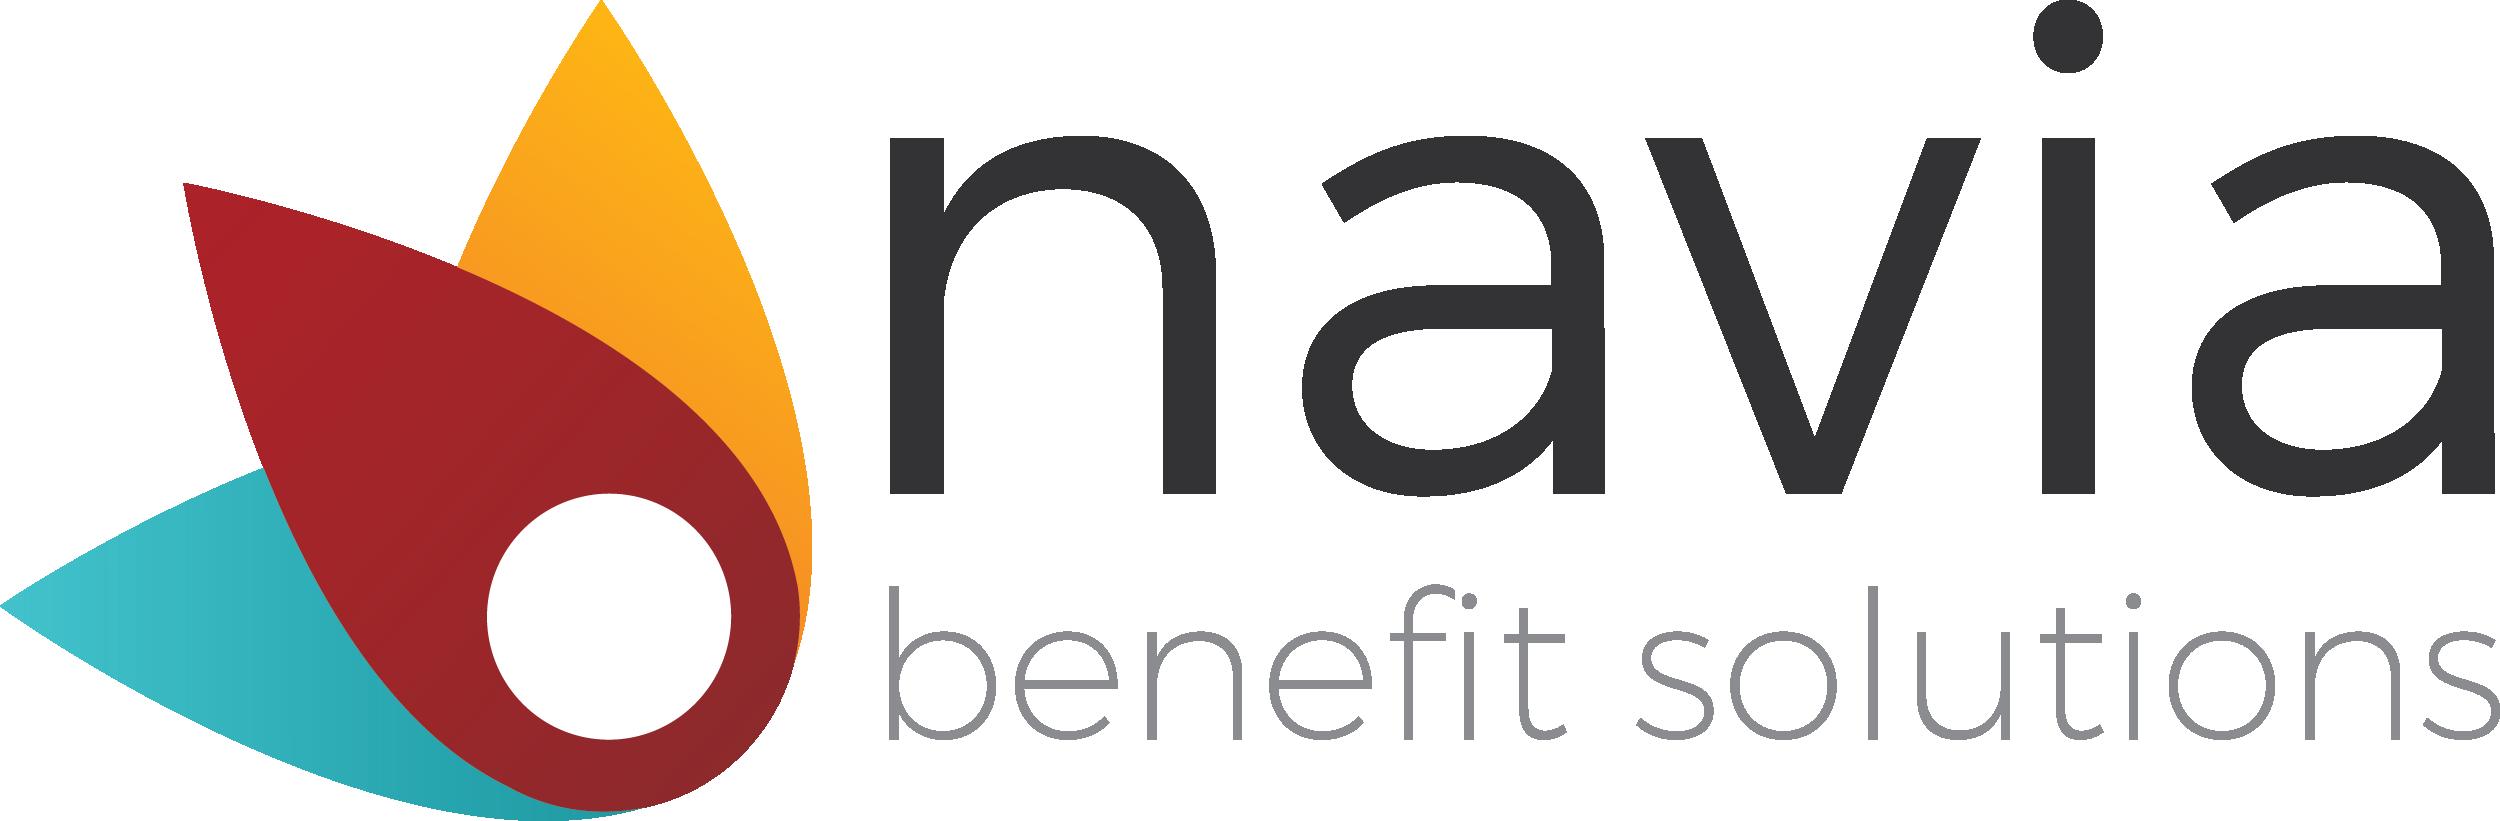 navia-logo-final-300-rgb_gradient-fullcolor-mark-type-tag.png